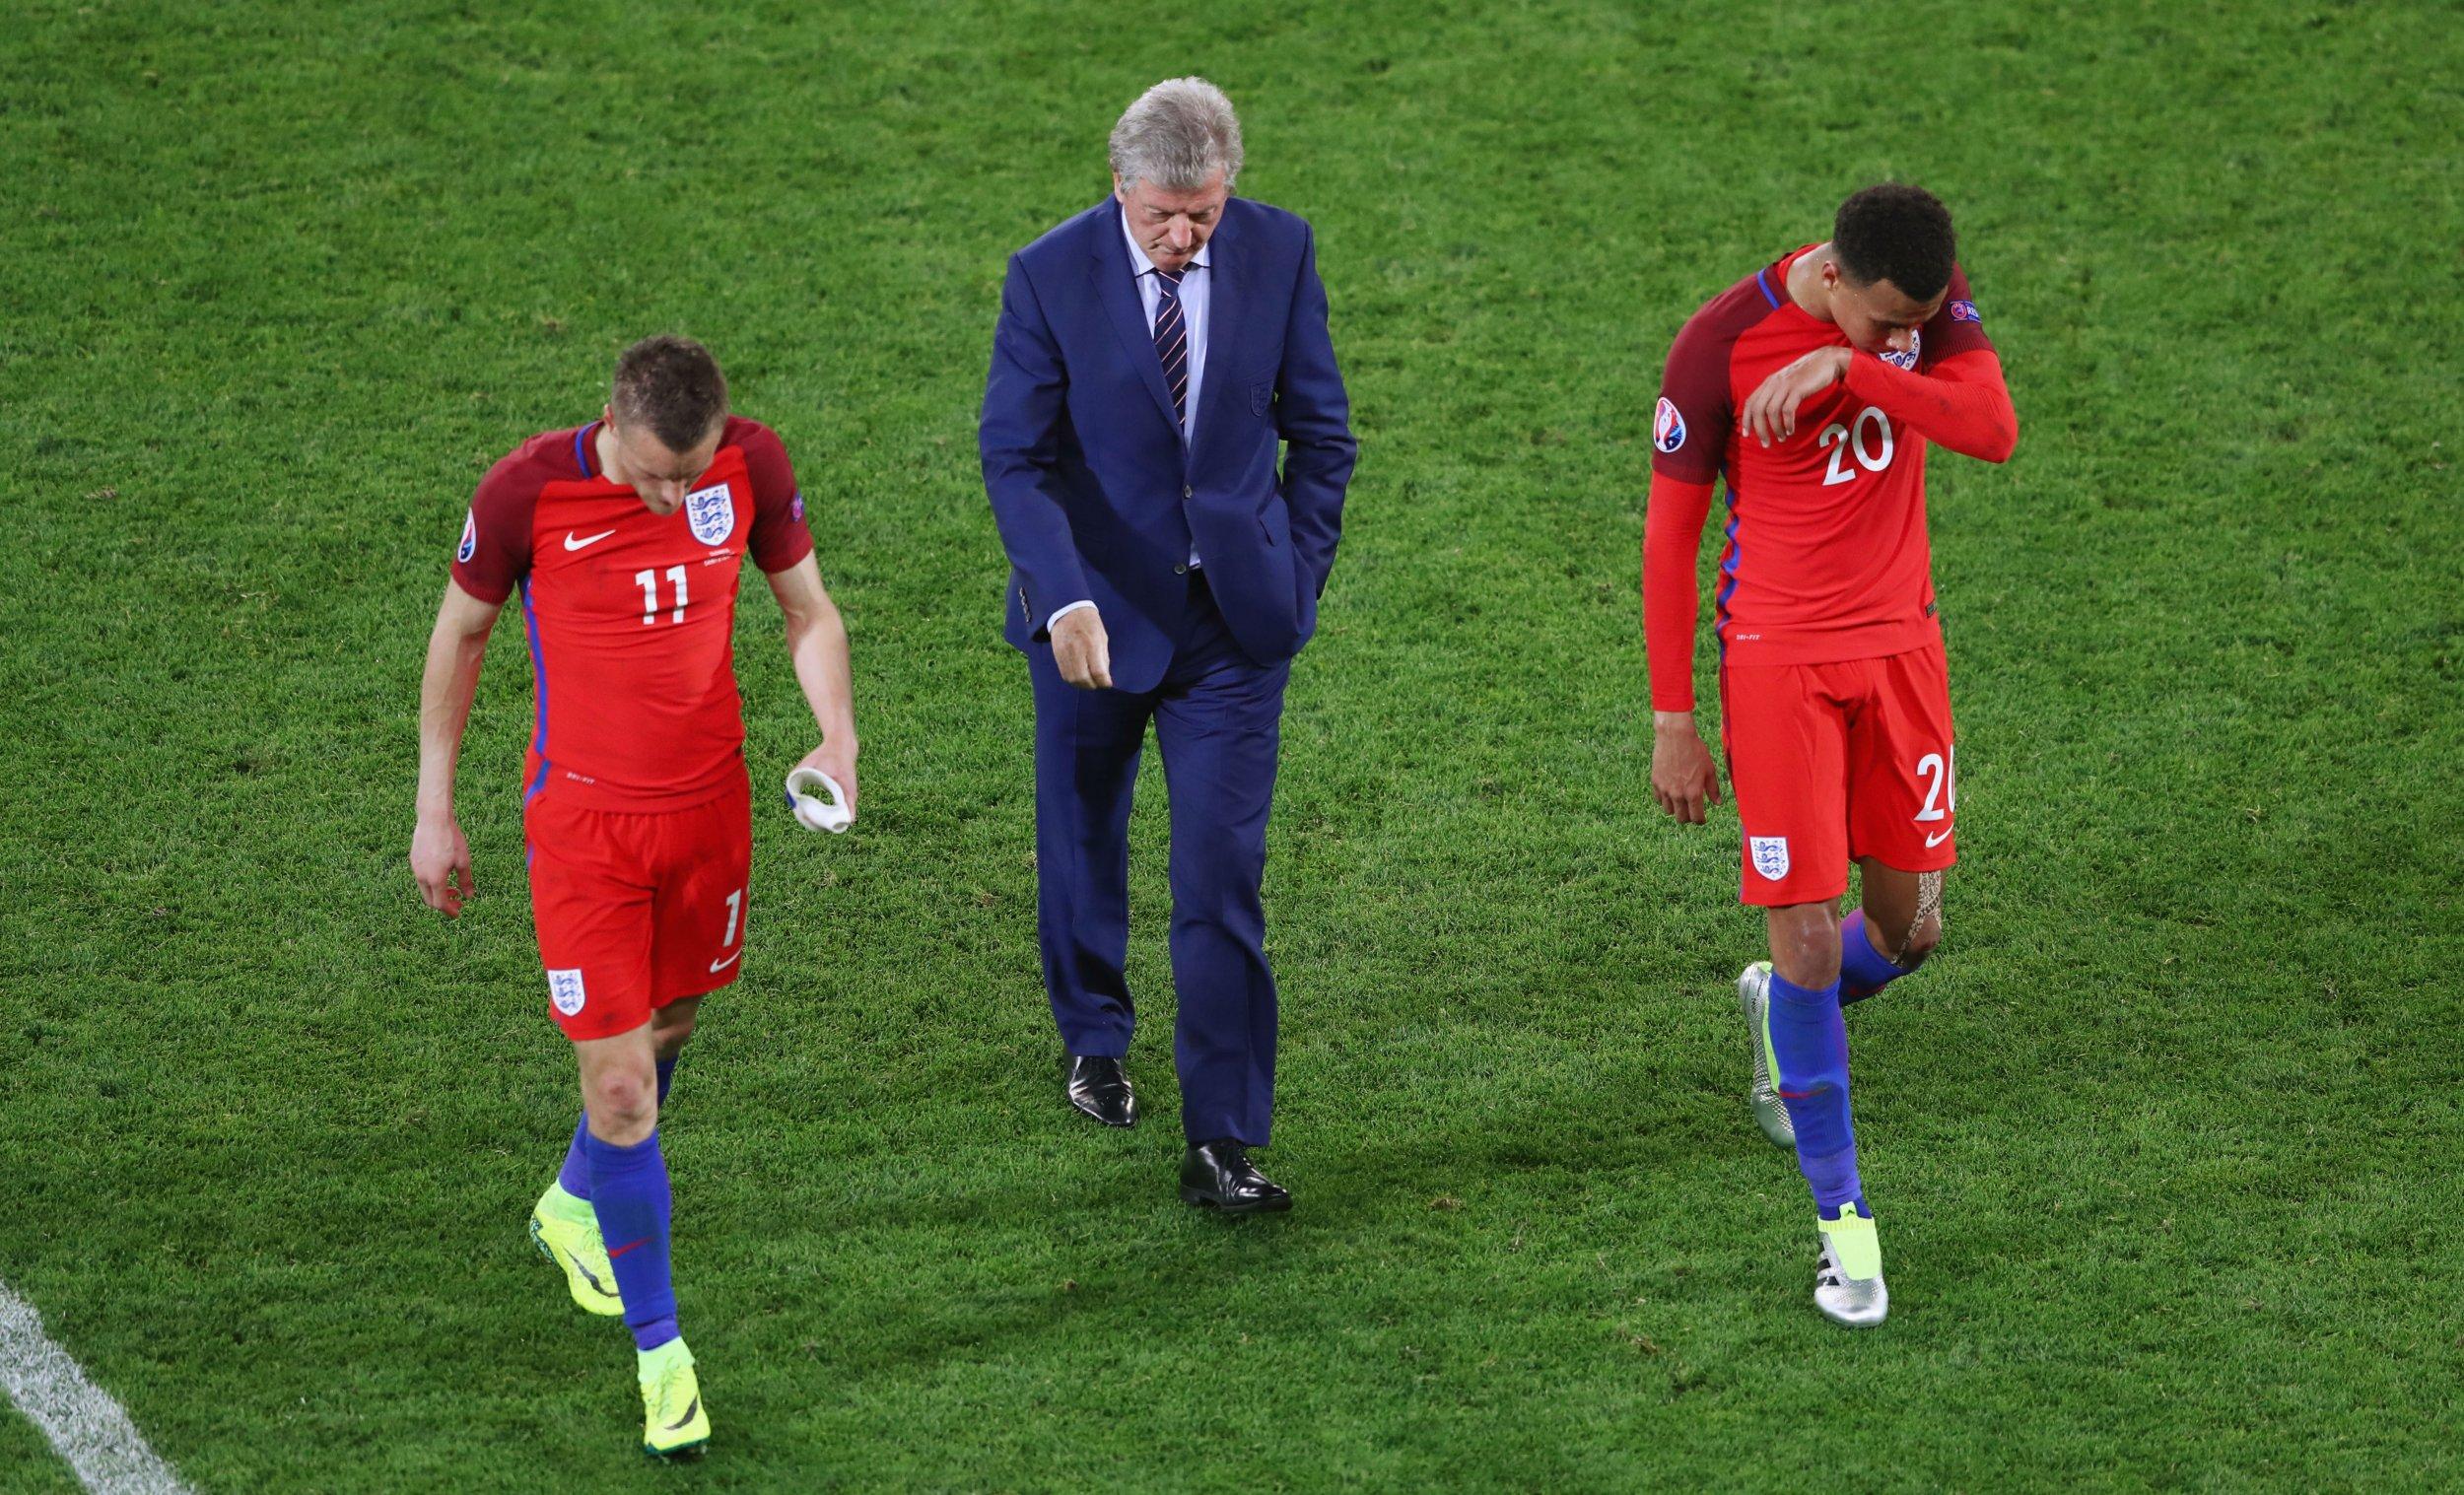 Jamie Vardy, Roy Hodgson and Dele Alli